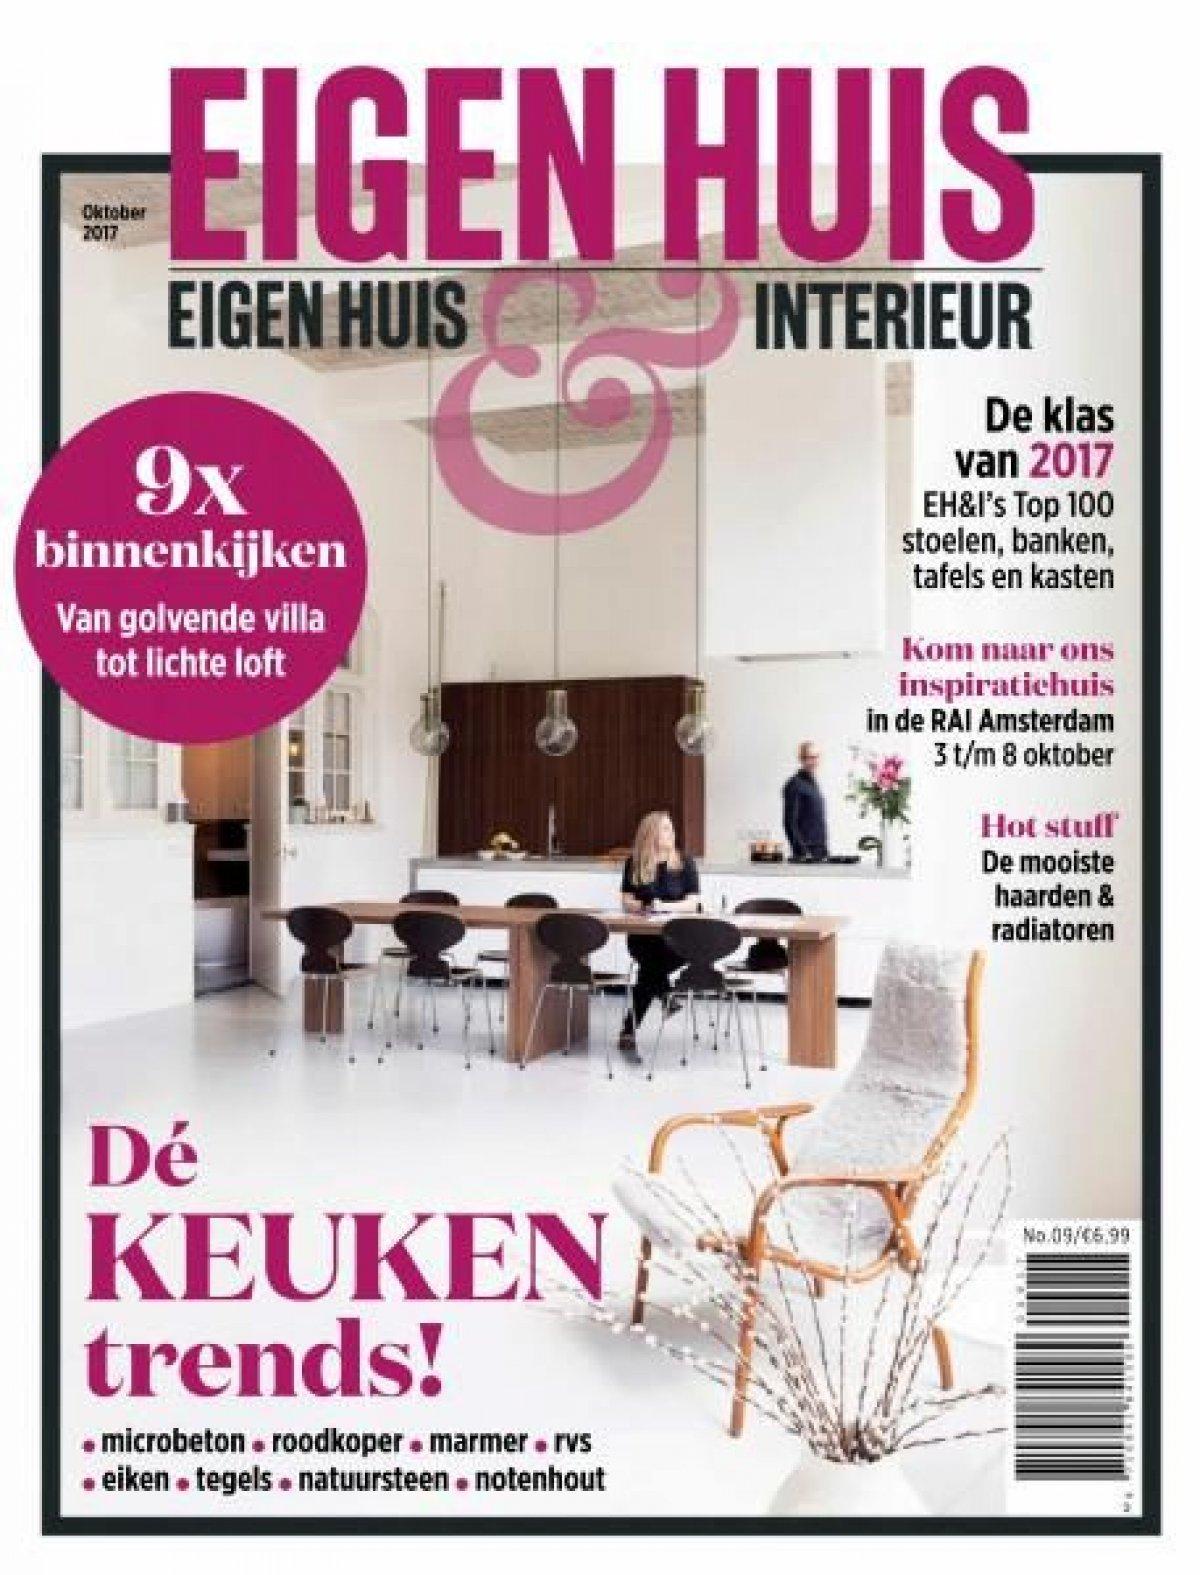 3 Design Stoelen.Eigen Huis Interieur Publications Design Furniture Jori